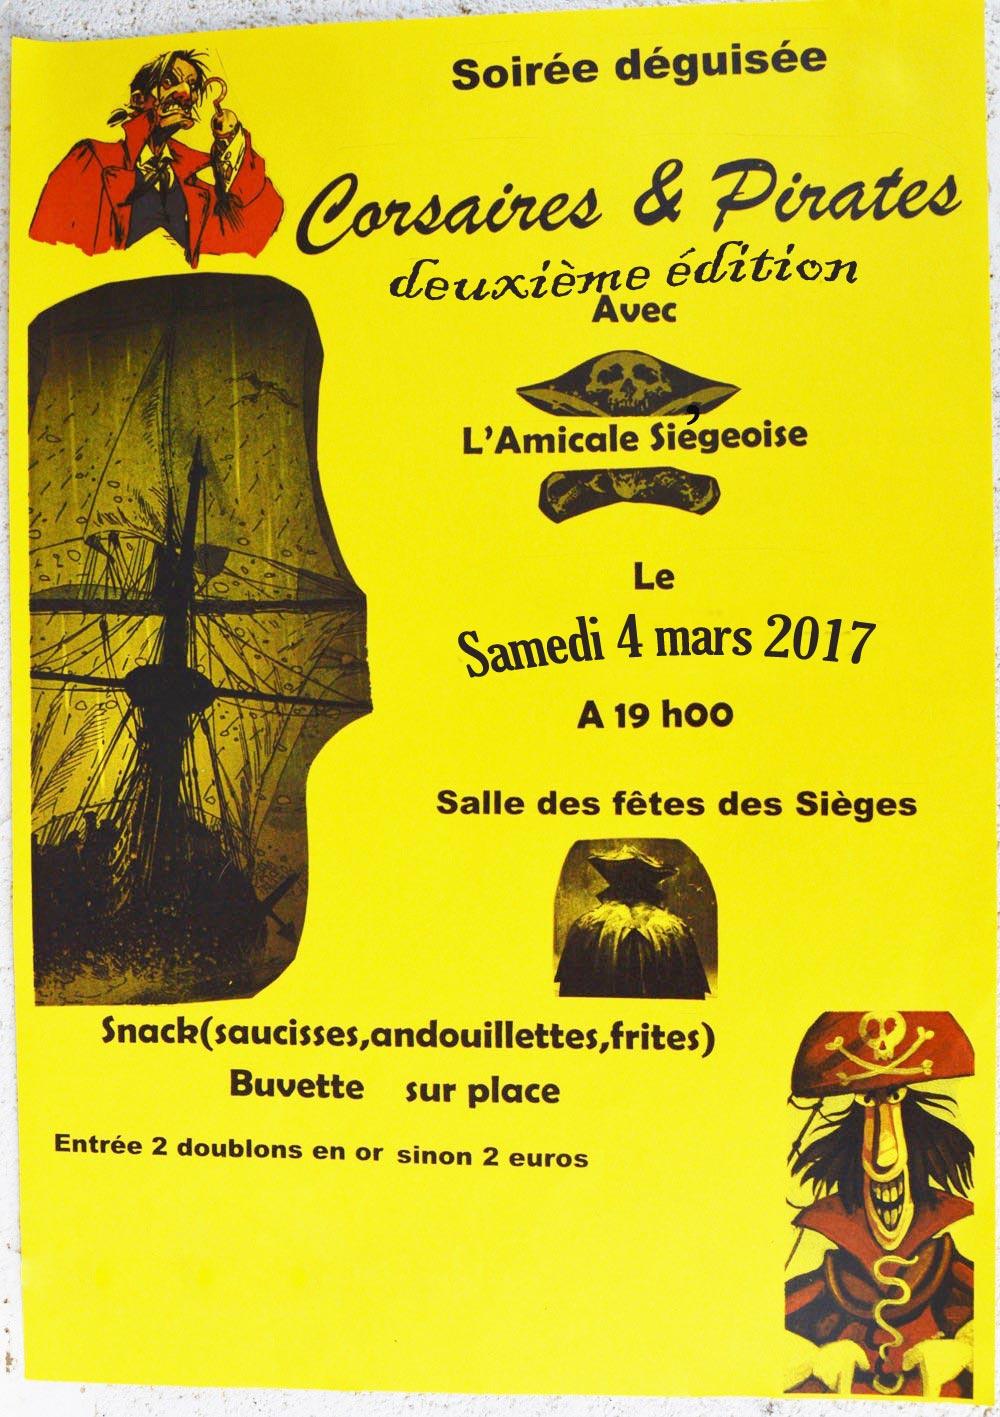 Corsaires et Pirates 2017